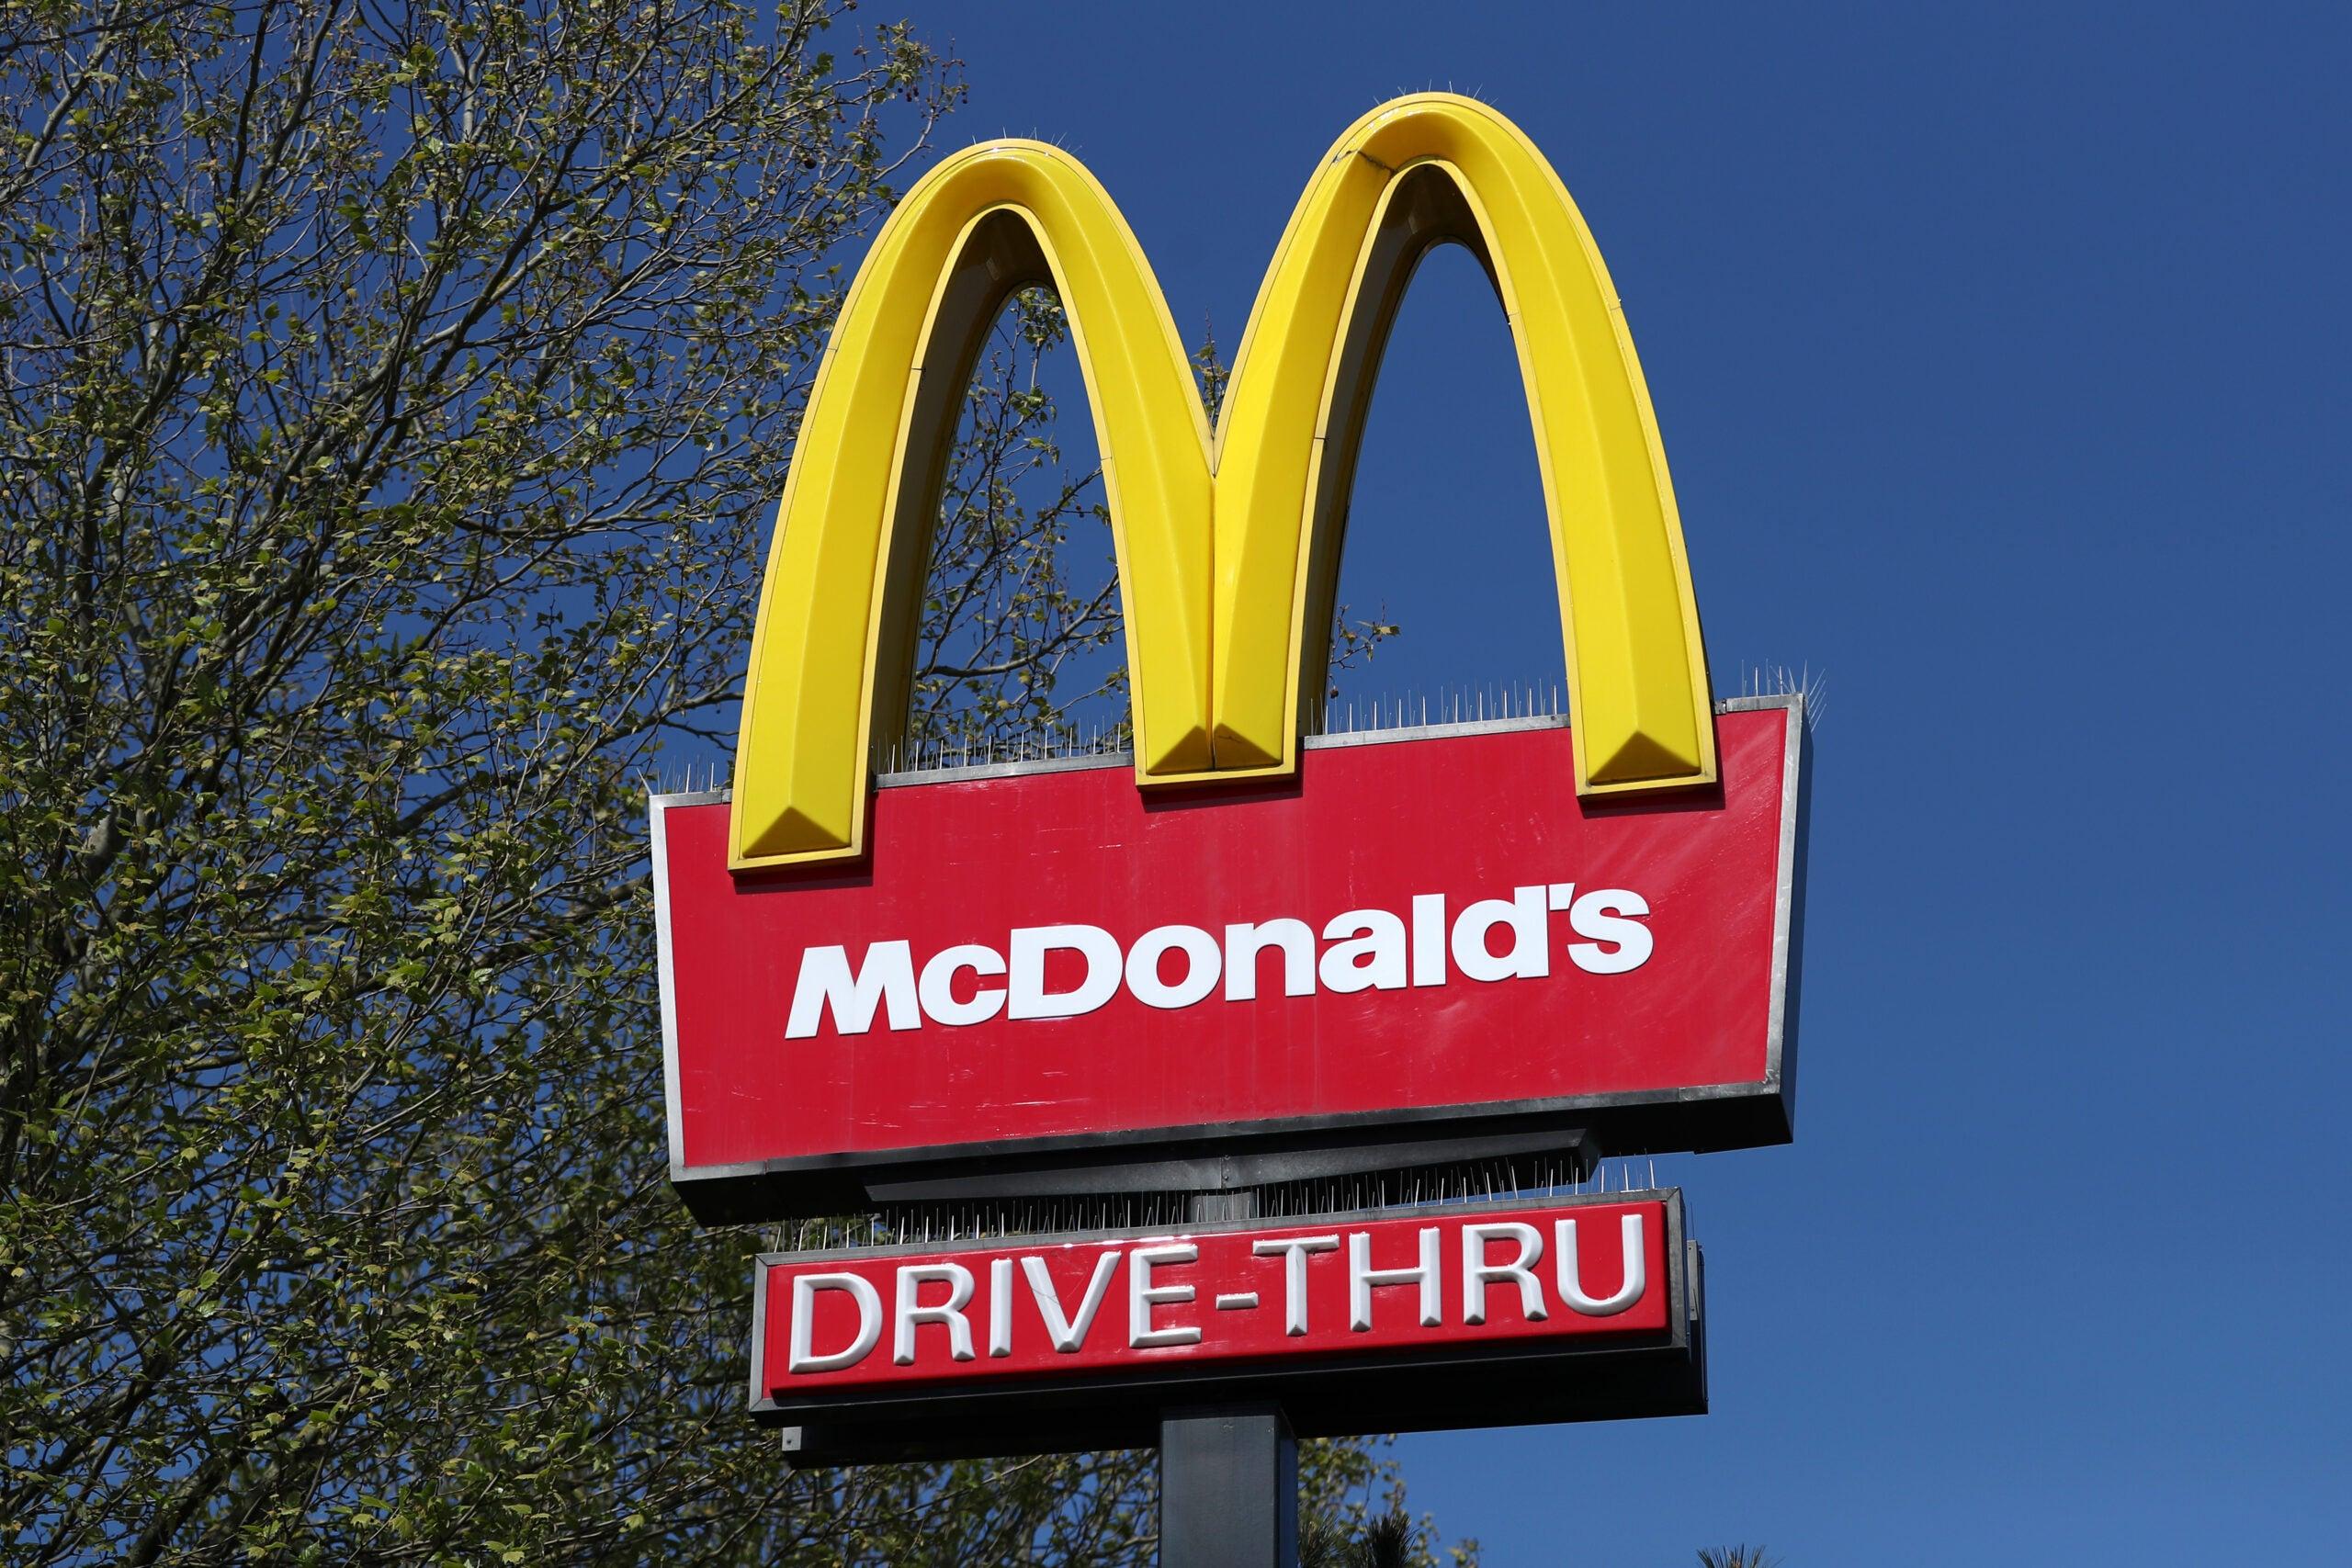 A McDonalds' restaurant sign.